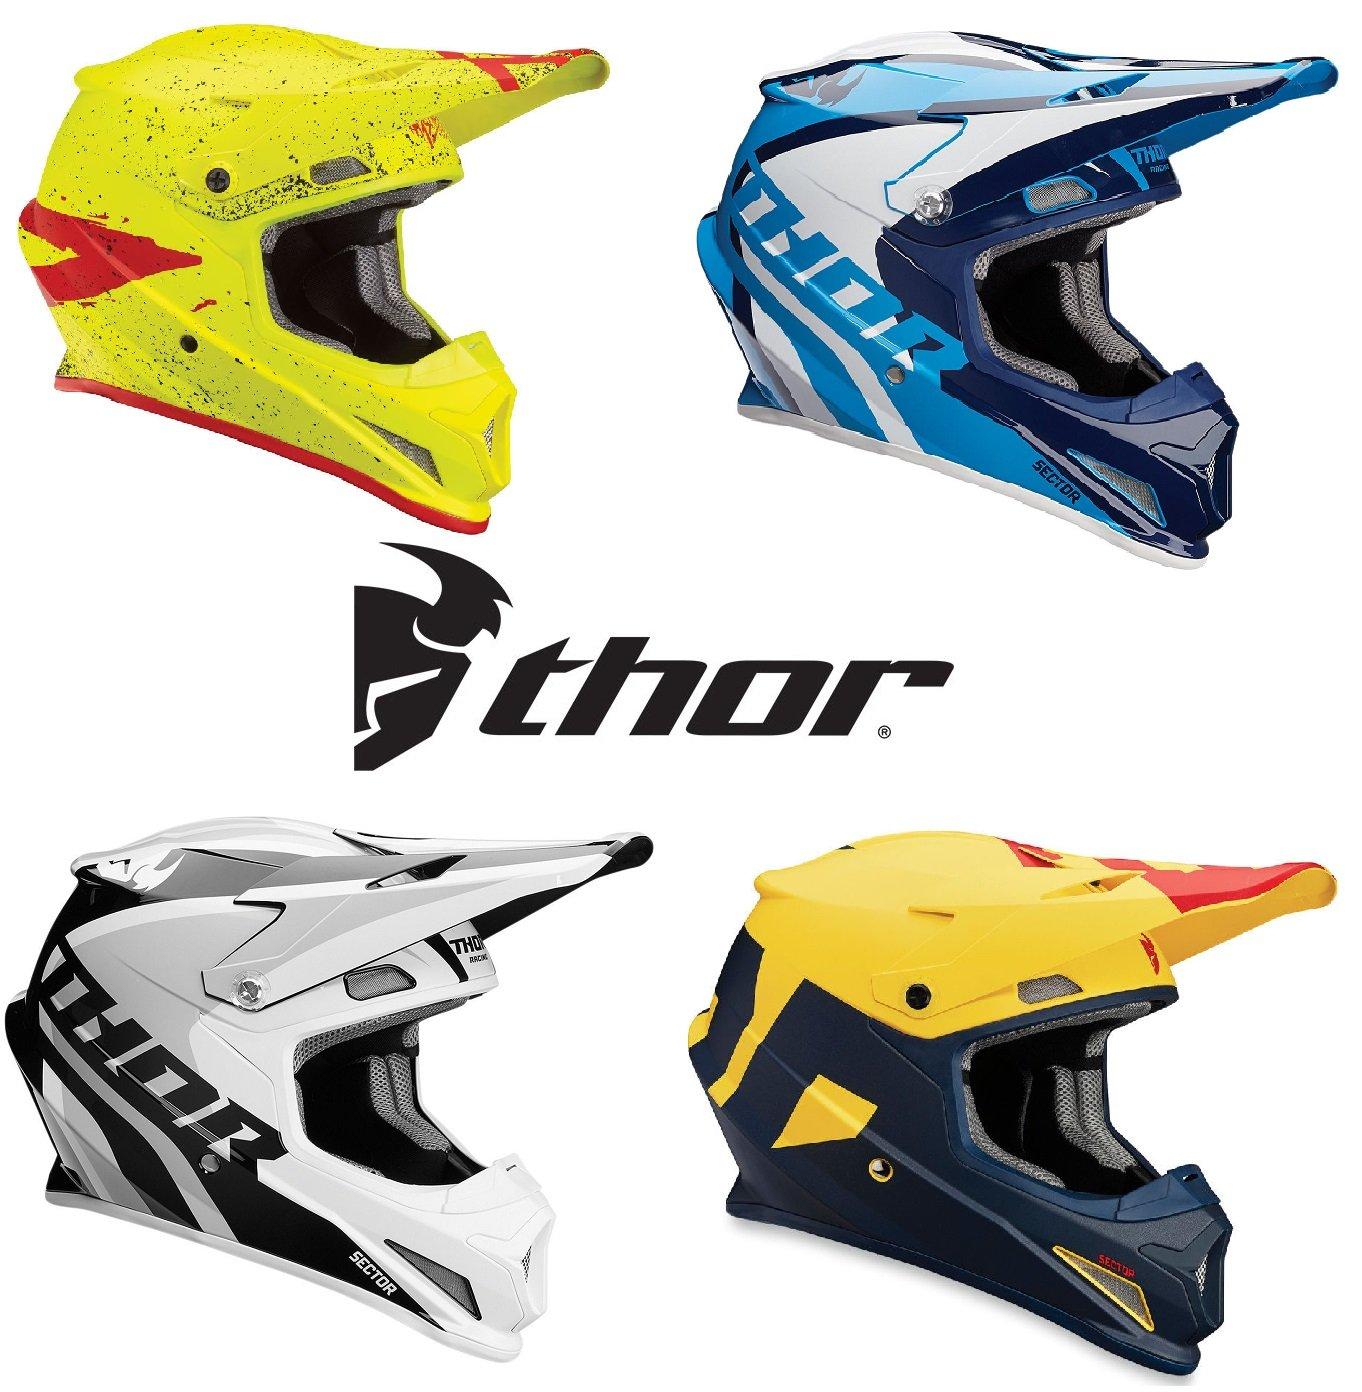 Adult Mx Helmet Wulfsport Sceptre Motorcycle Motorbike Quad Dirt Bike ATV Off Road Racing Enduro Motocross Helmet Black